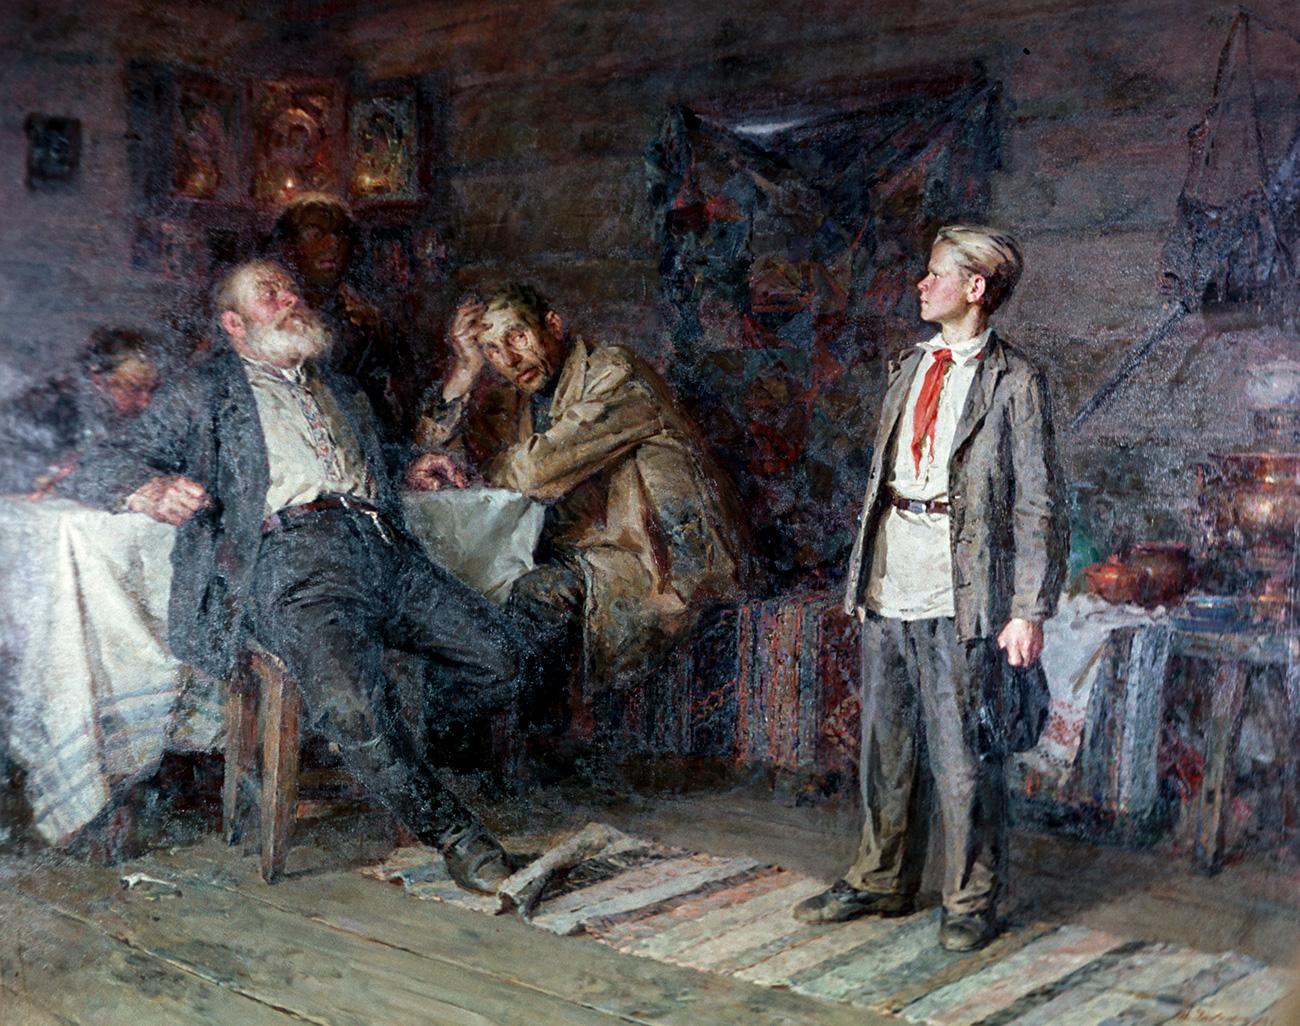 Lukisan sosok Pavlik Morozov oleh Nikita Chebakov. 1952. Sumber: Saikov / RIA Novosti